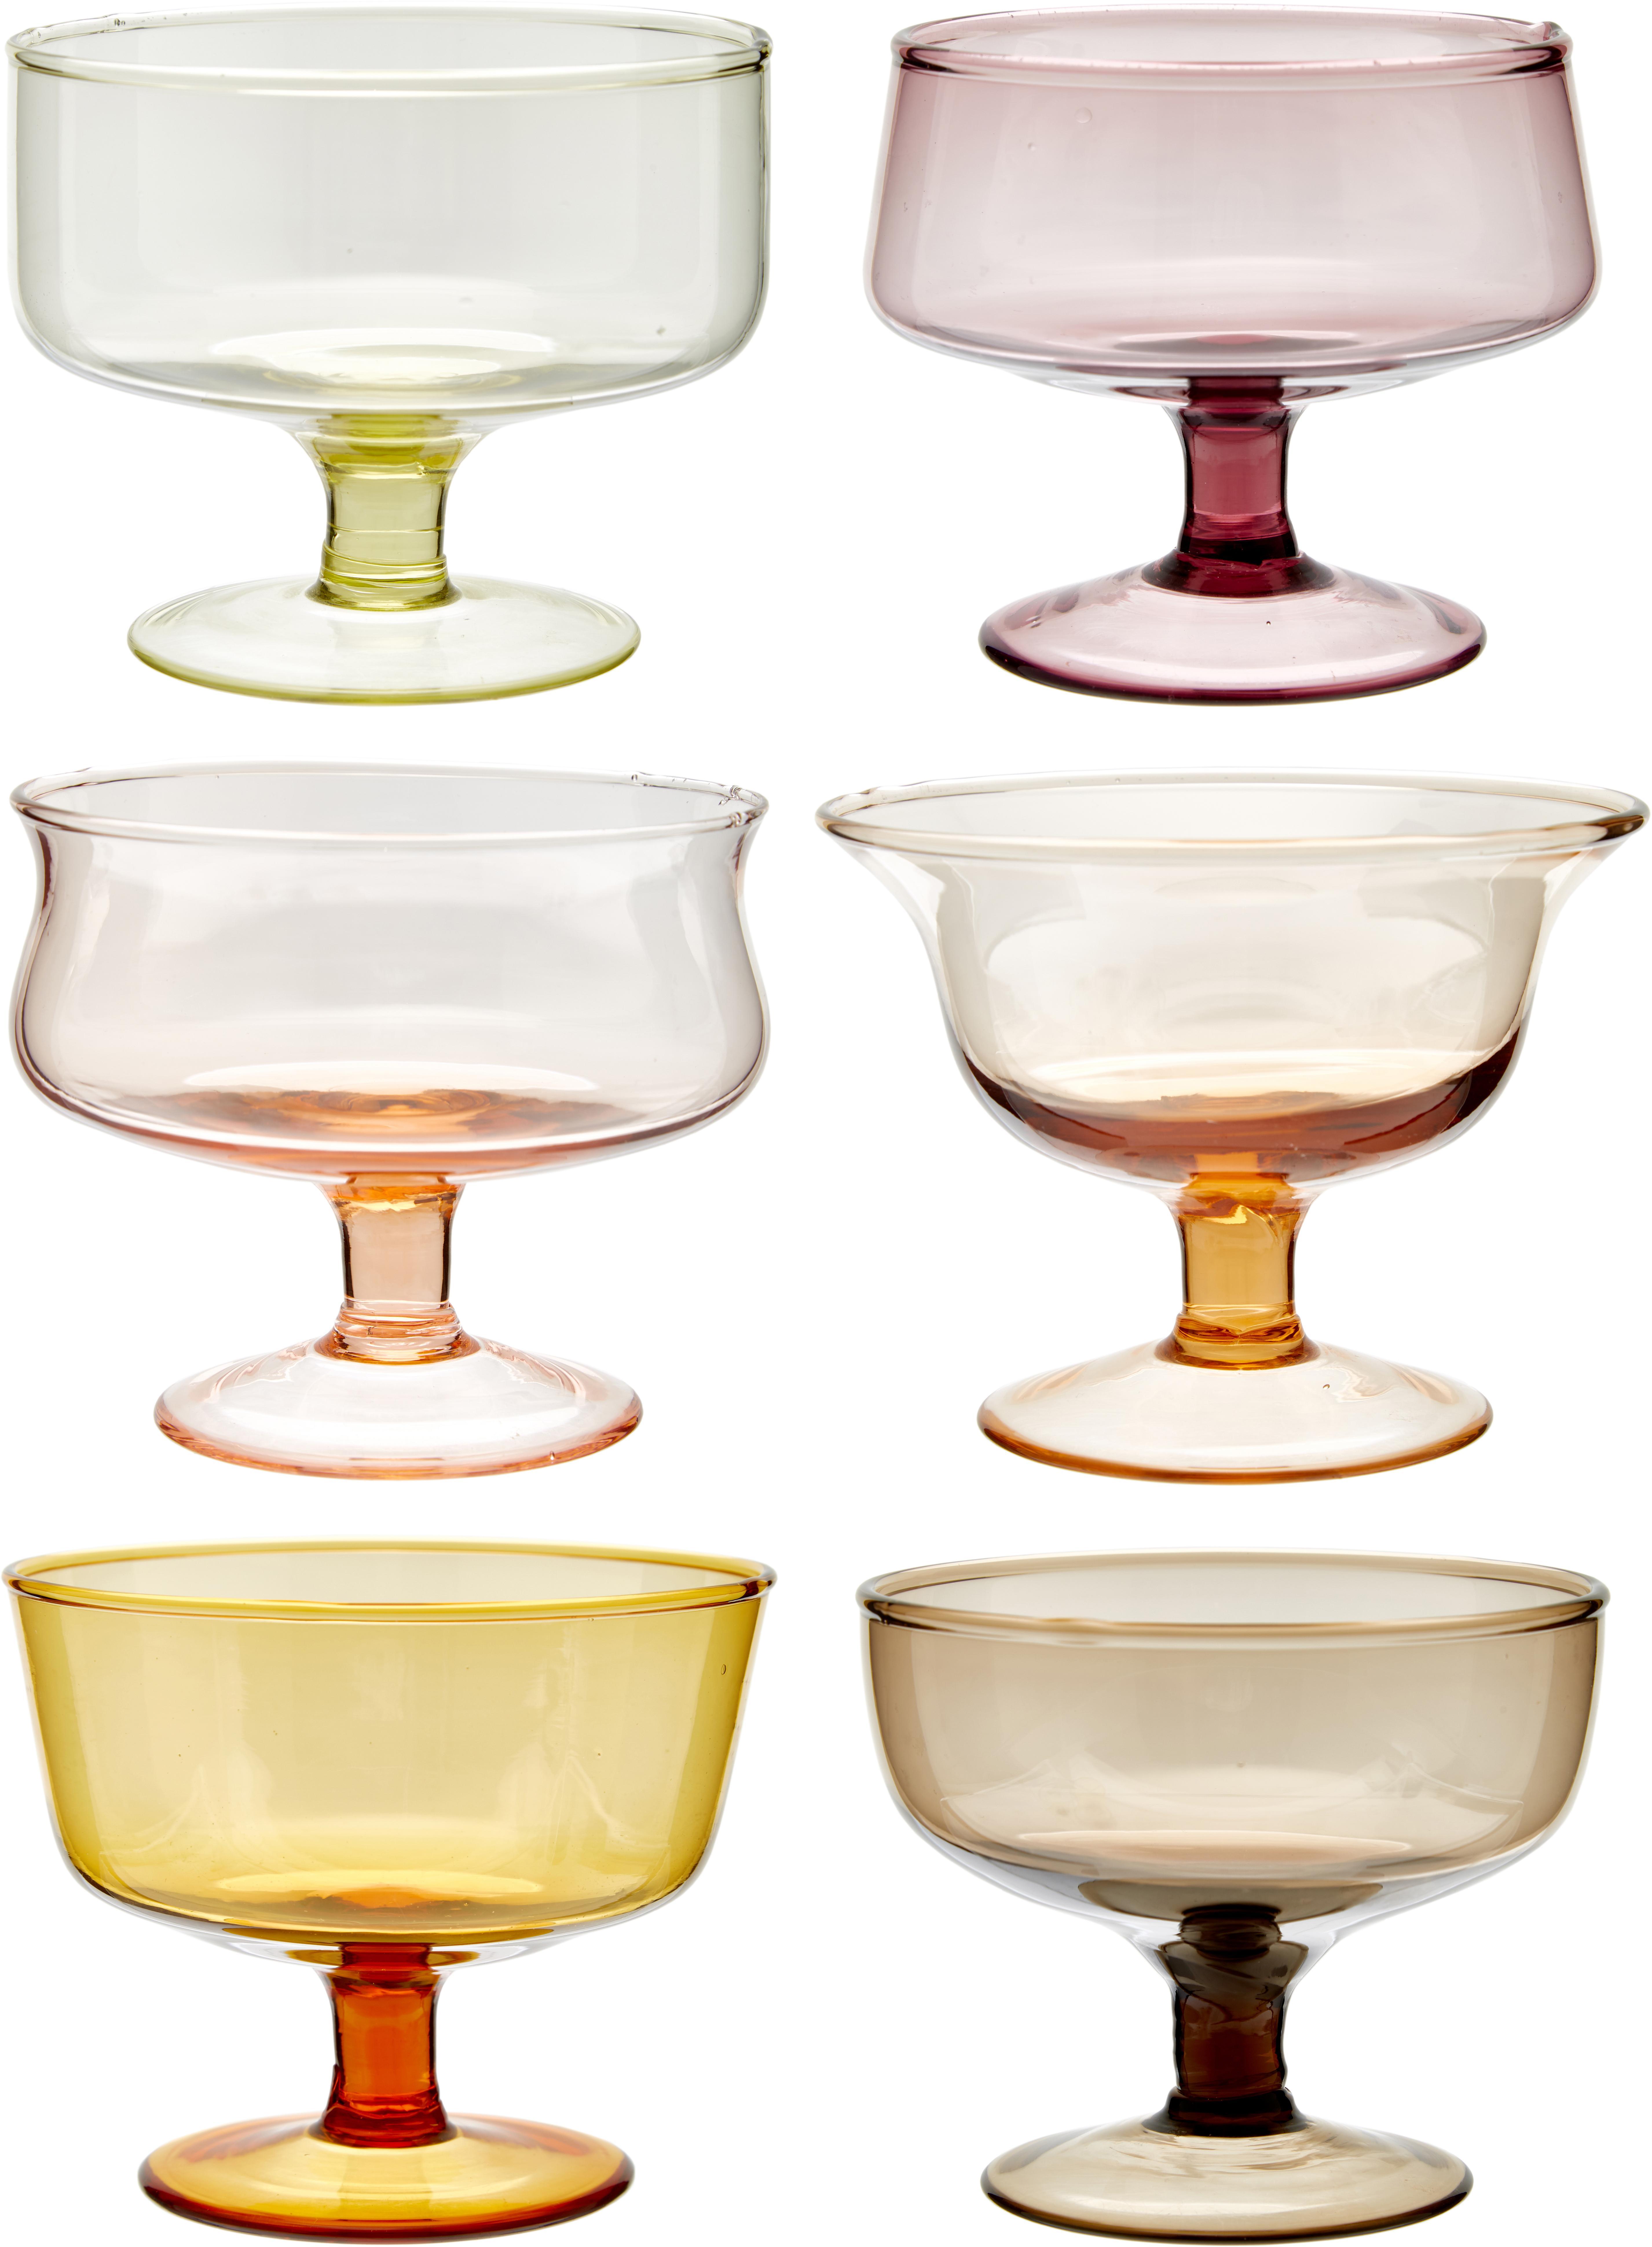 Mondgeblazen ijsschalenset Desigual, 6-delig, Mondgeblazen glas, Multicolour, Ø 12 x H 8 cm